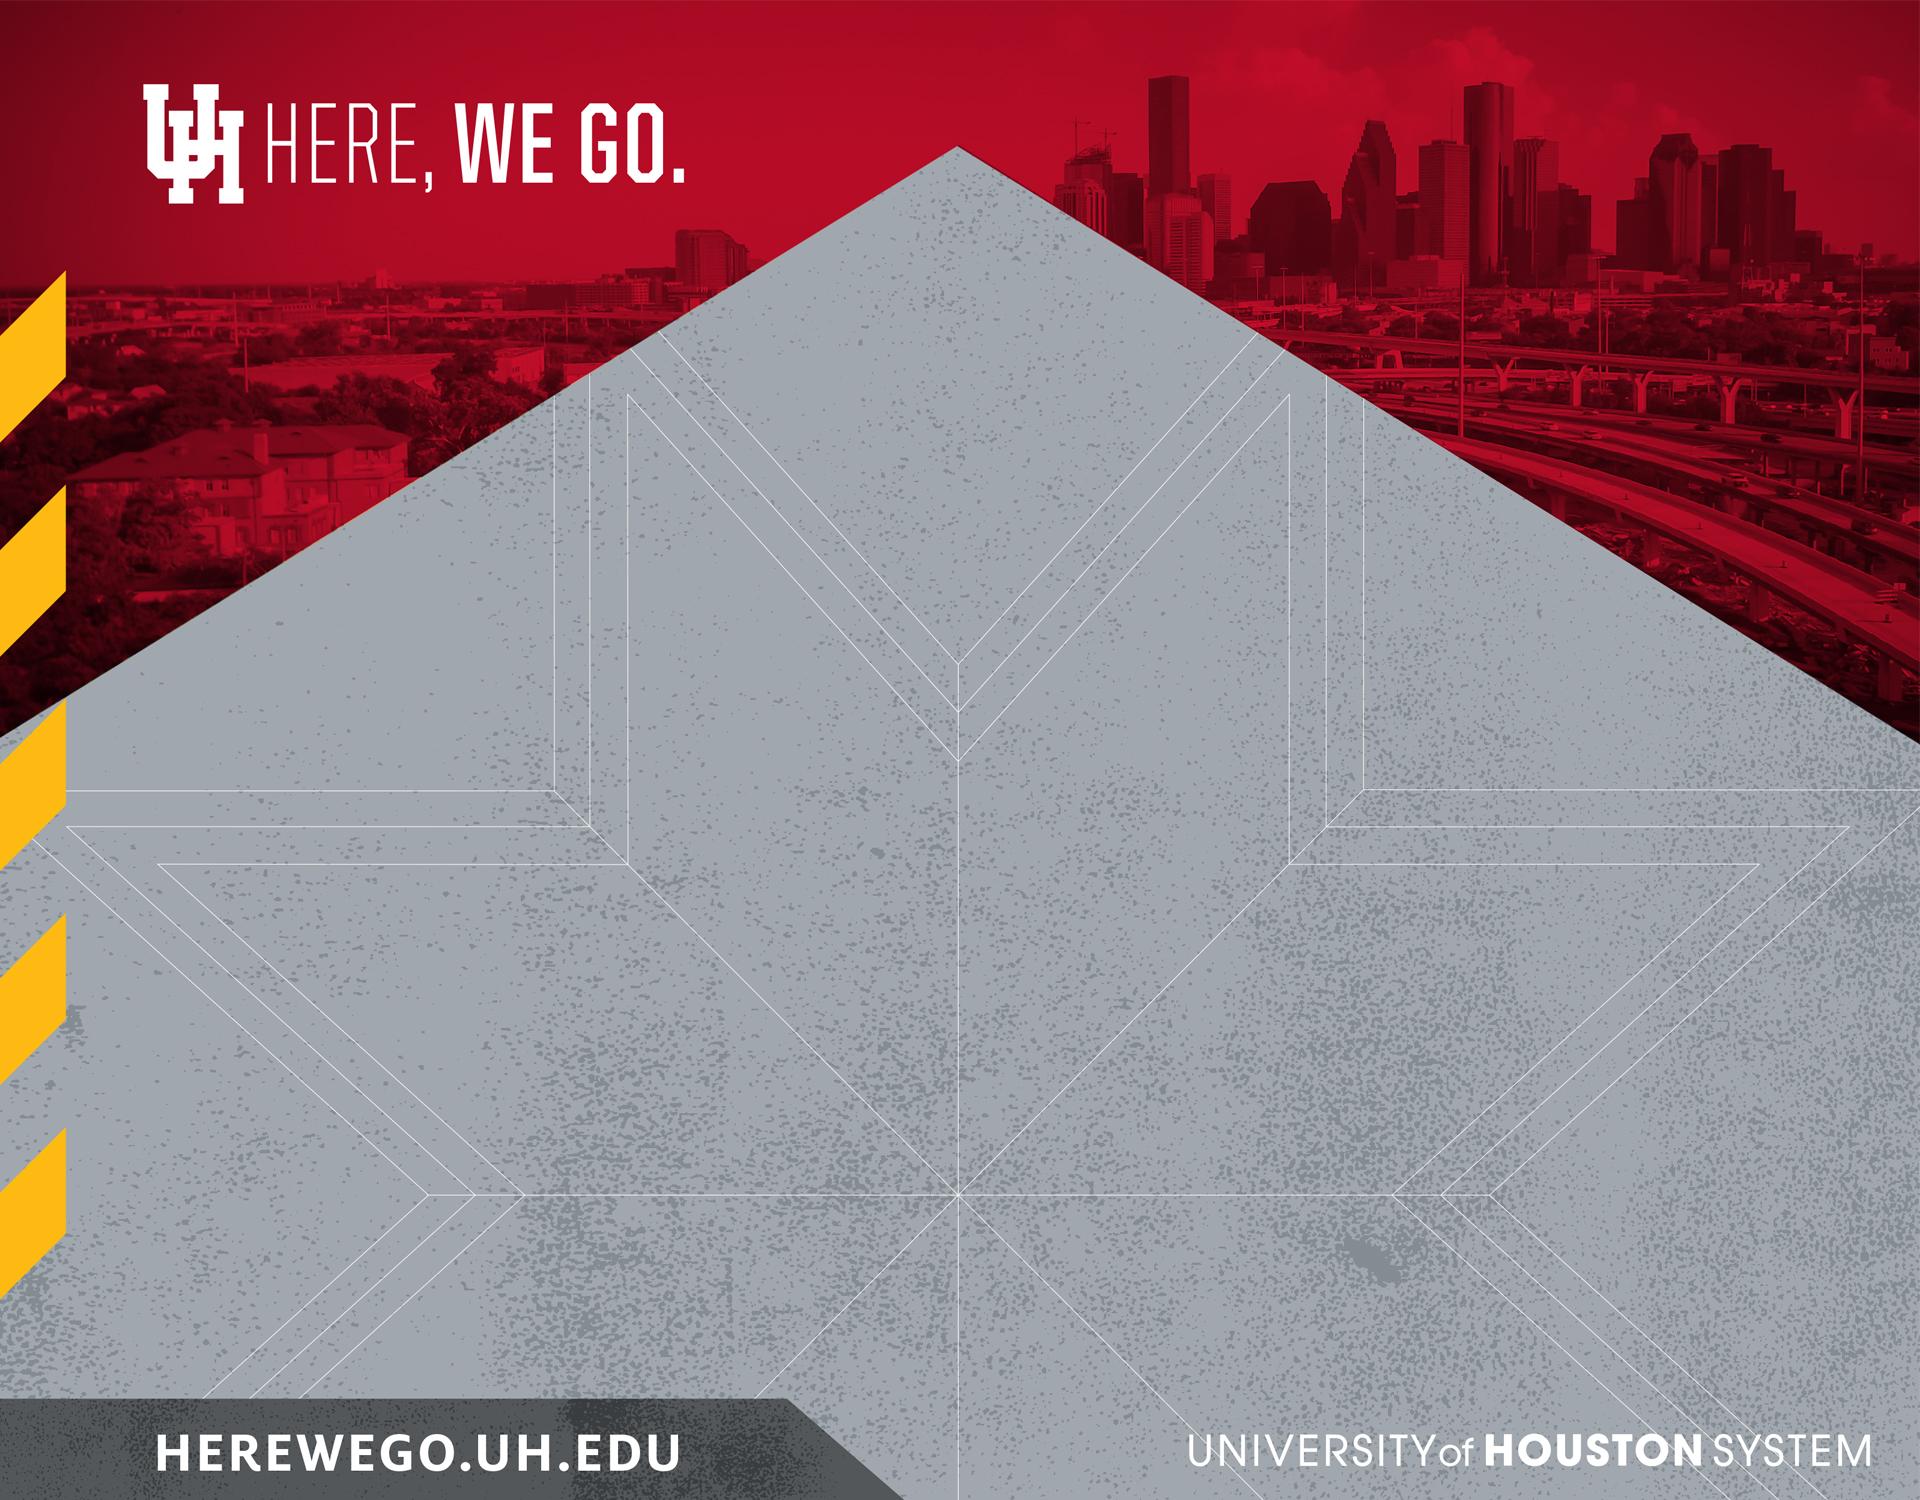 UH - herewego.uh.edu